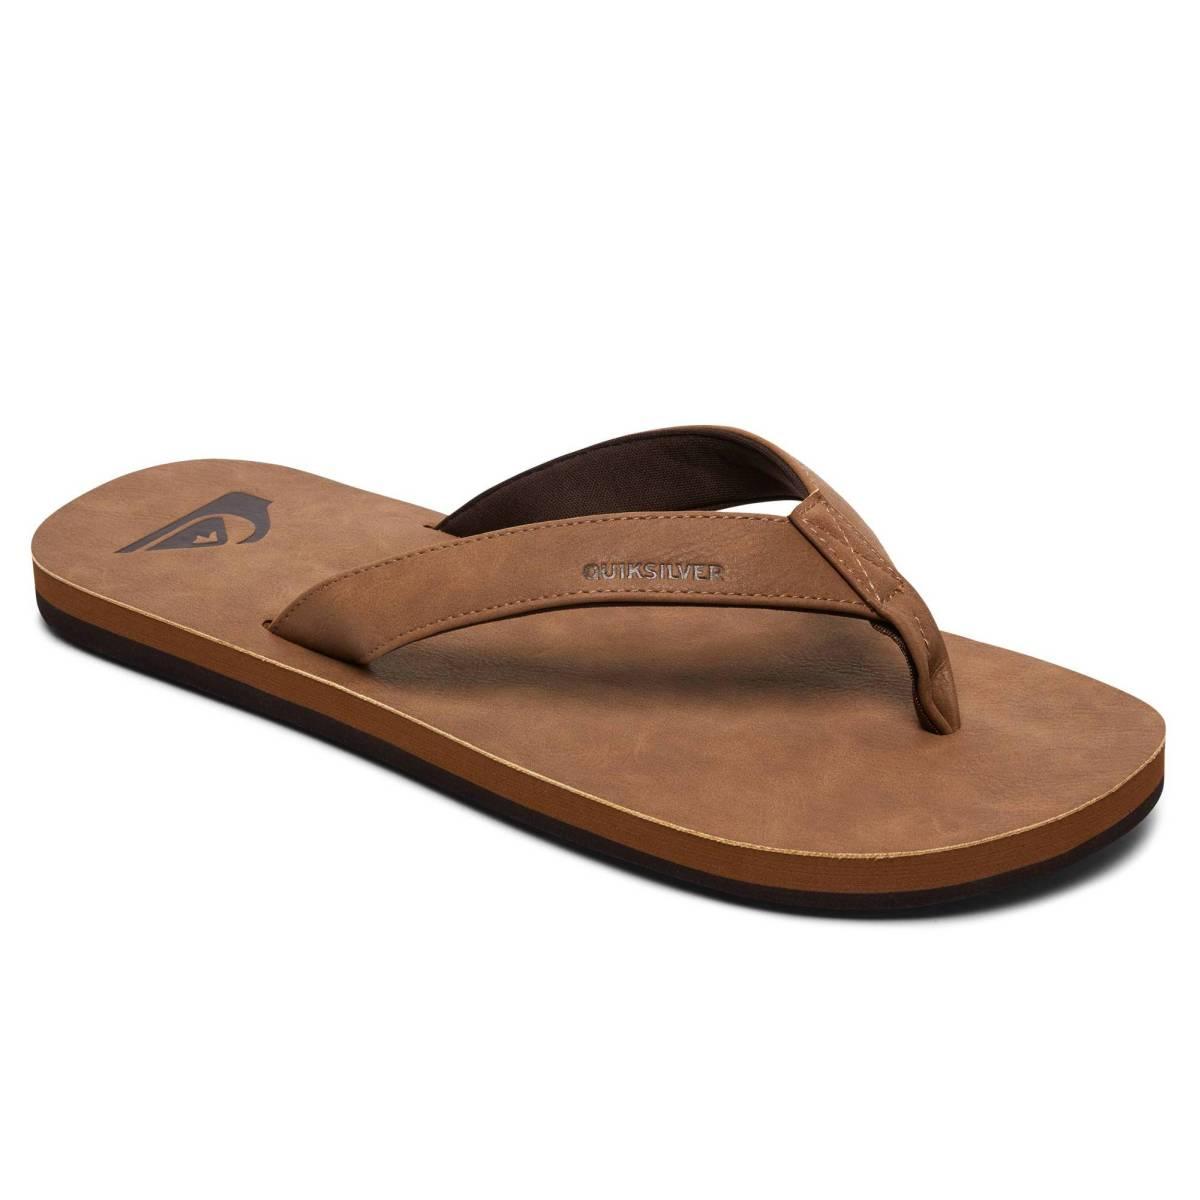 QUIKSILVER Molokai Nubuck Leder Schuhe Zehenstegsandale Natur Tan Solid Herren